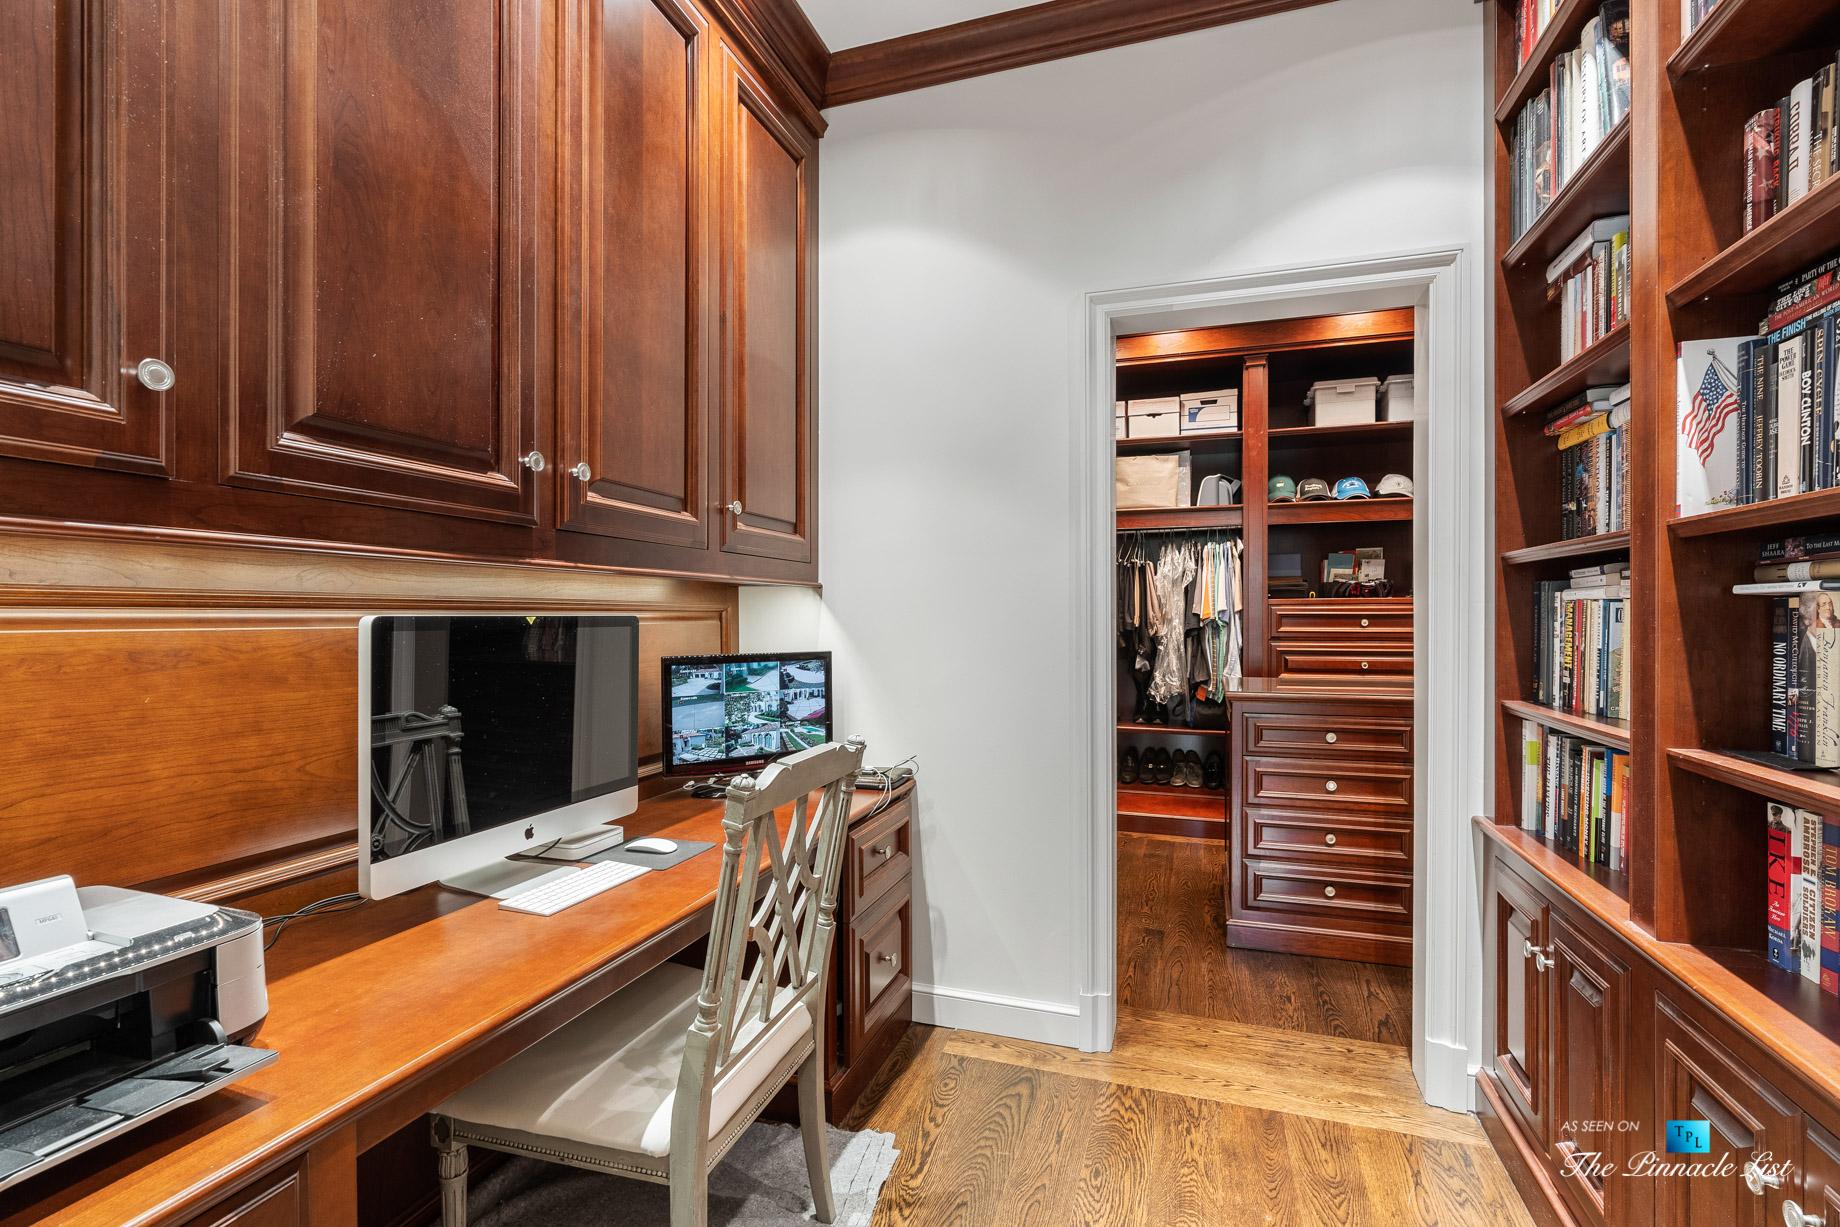 439 Blackland Rd NW, Atlanta, GA, USA – Private Computer Room – Luxury Real Estate – Tuxedo Park Mediterranean Mansion Home